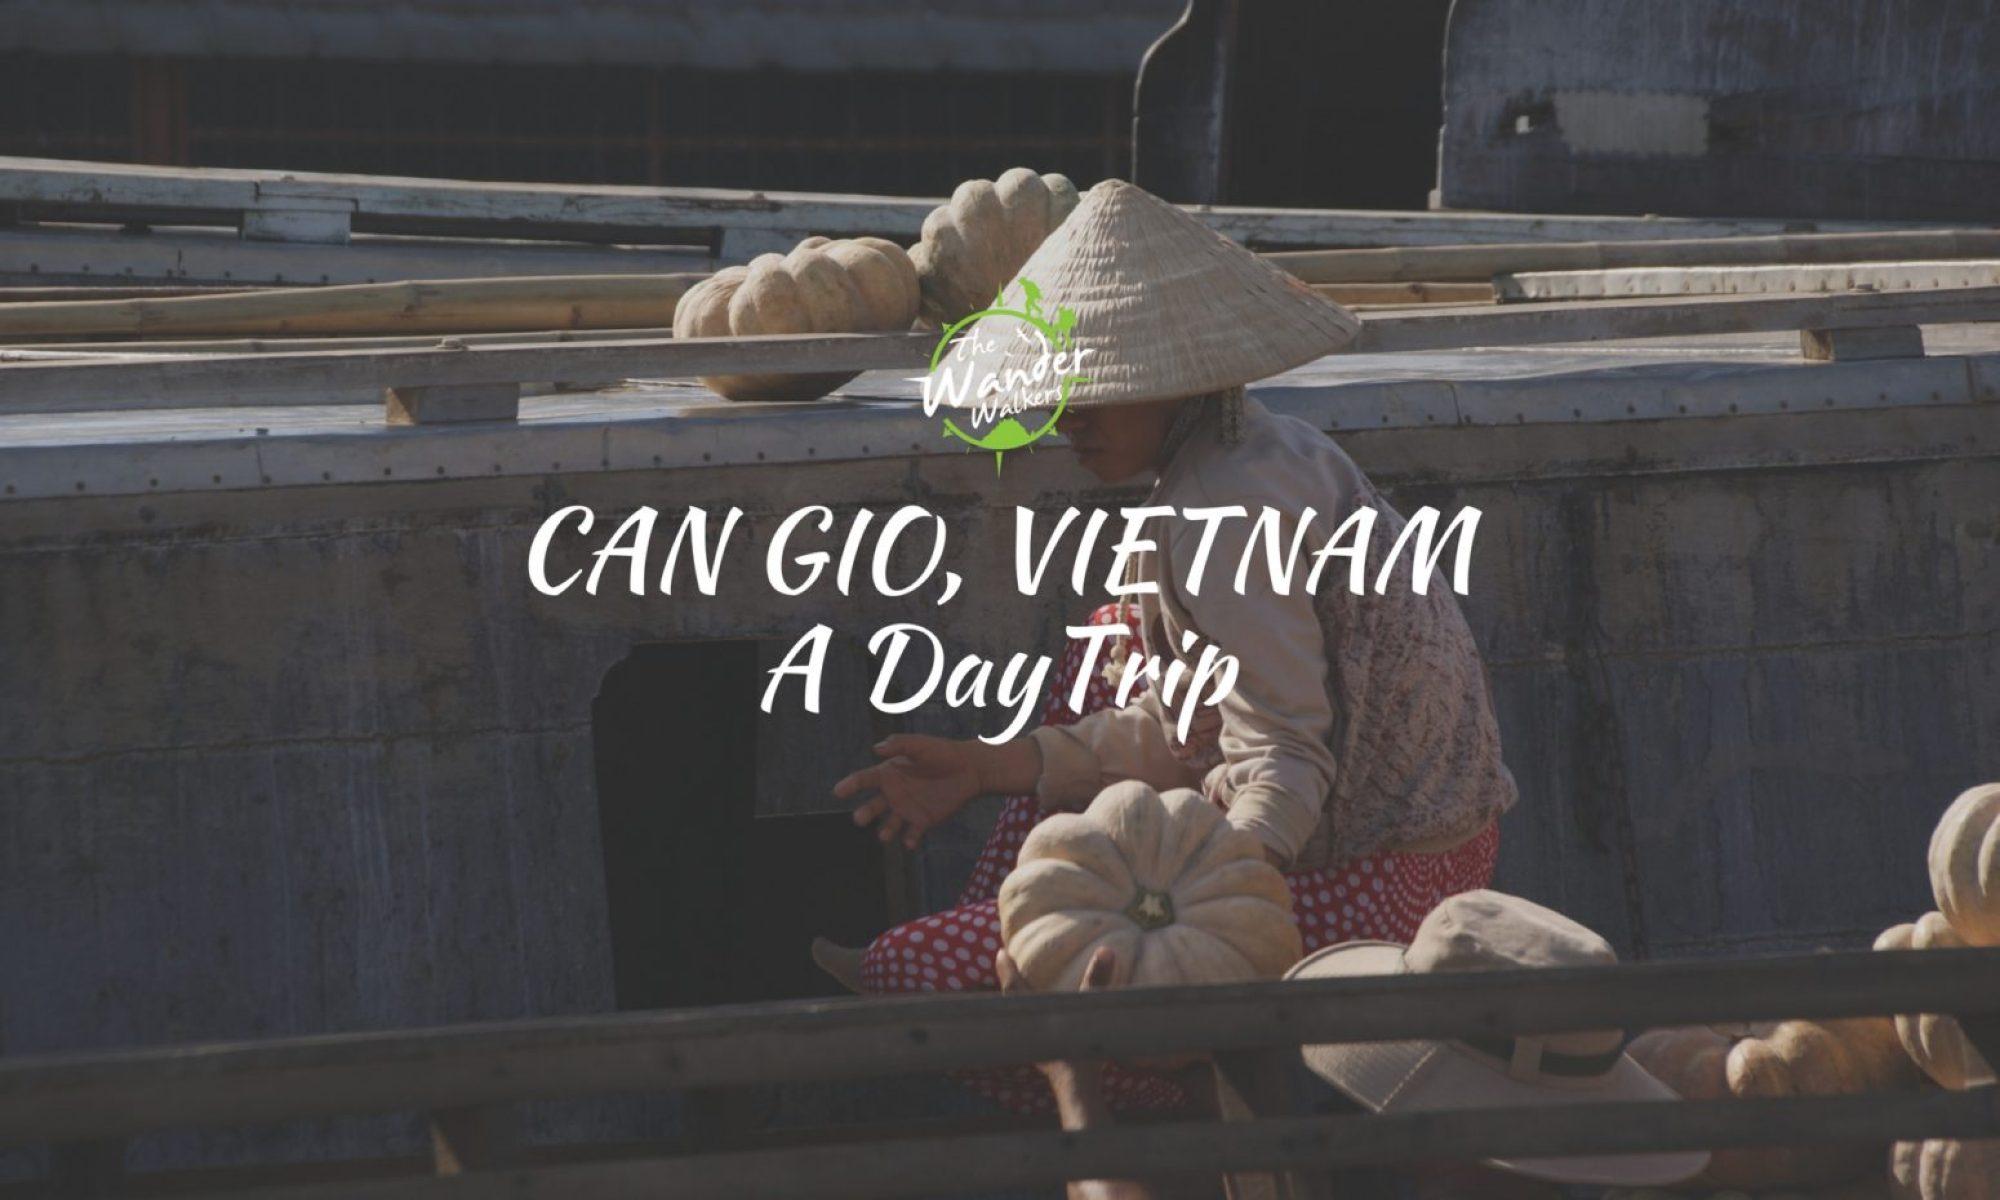 can gio vietnam